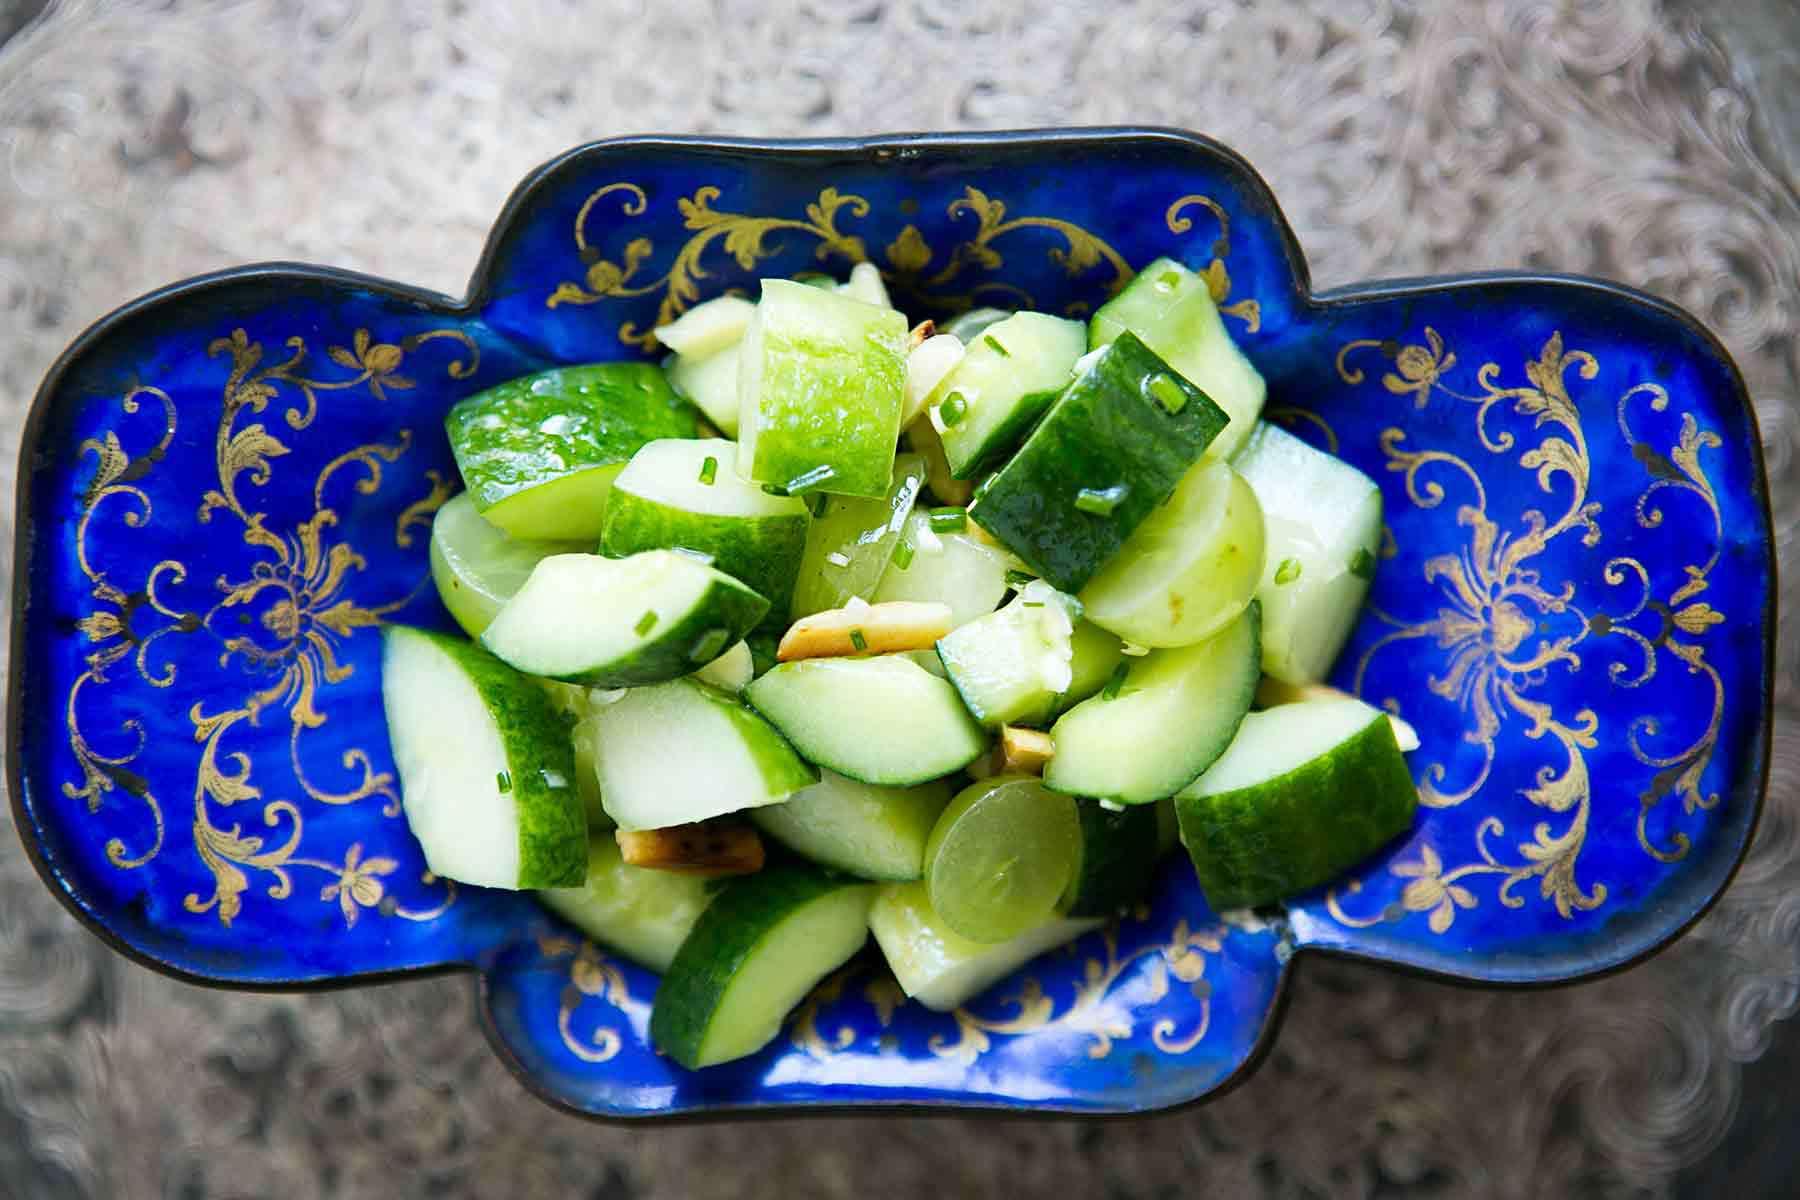 Bowl of sliced cucumber salad